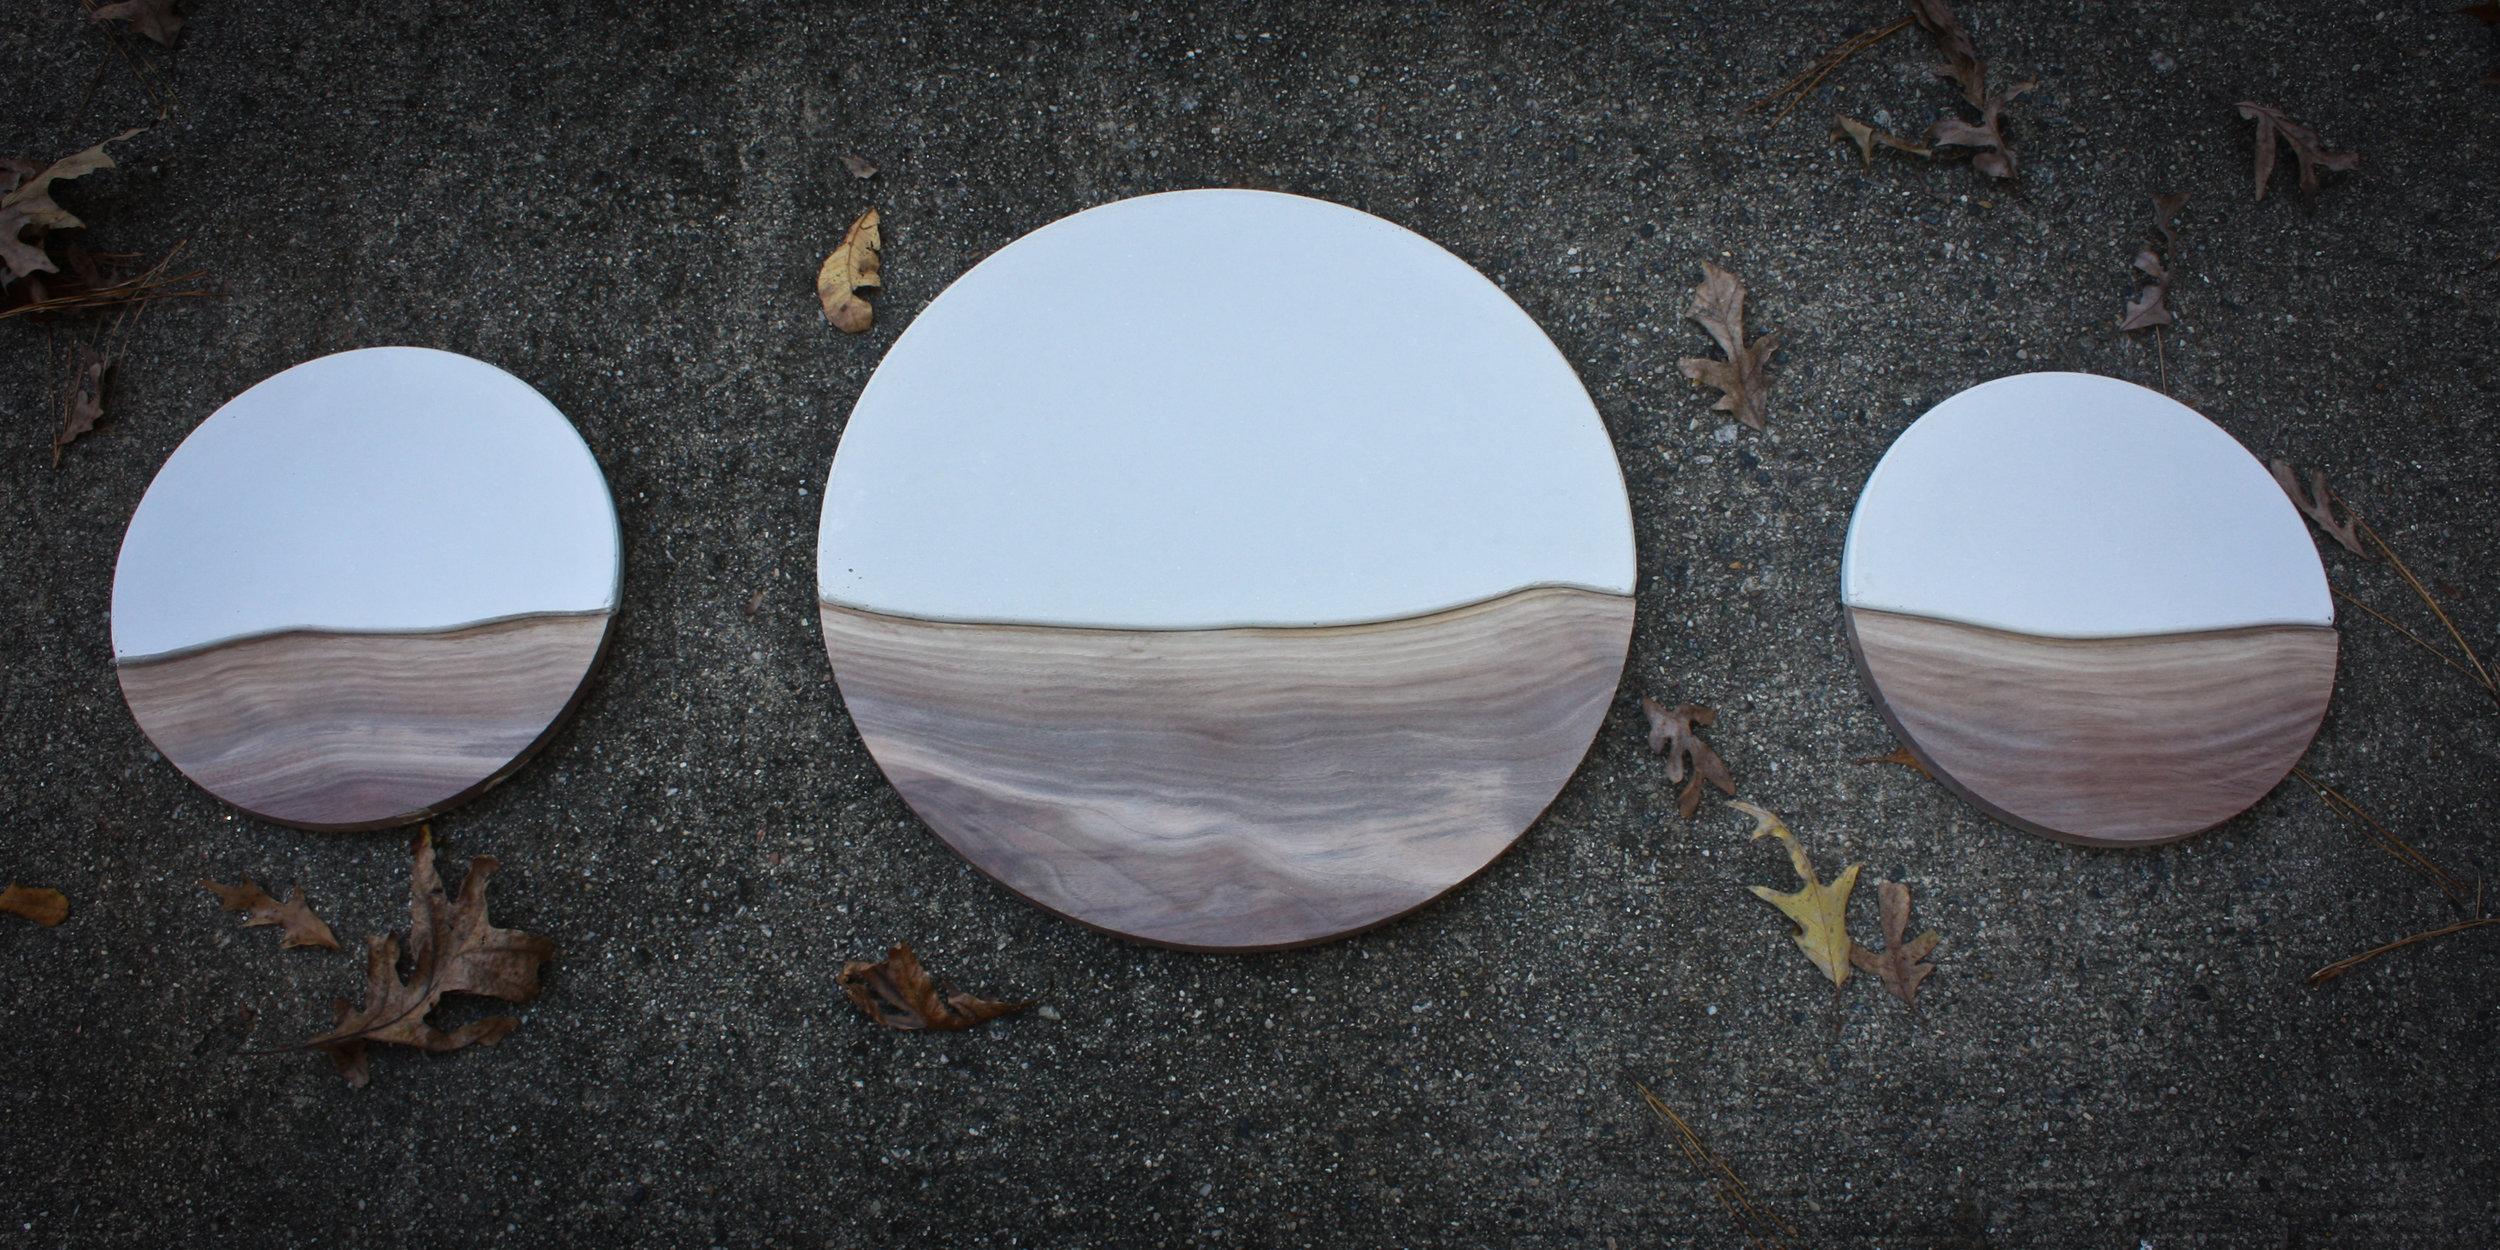 Alicia_Dietz_Wood_Concrete-8.jpg